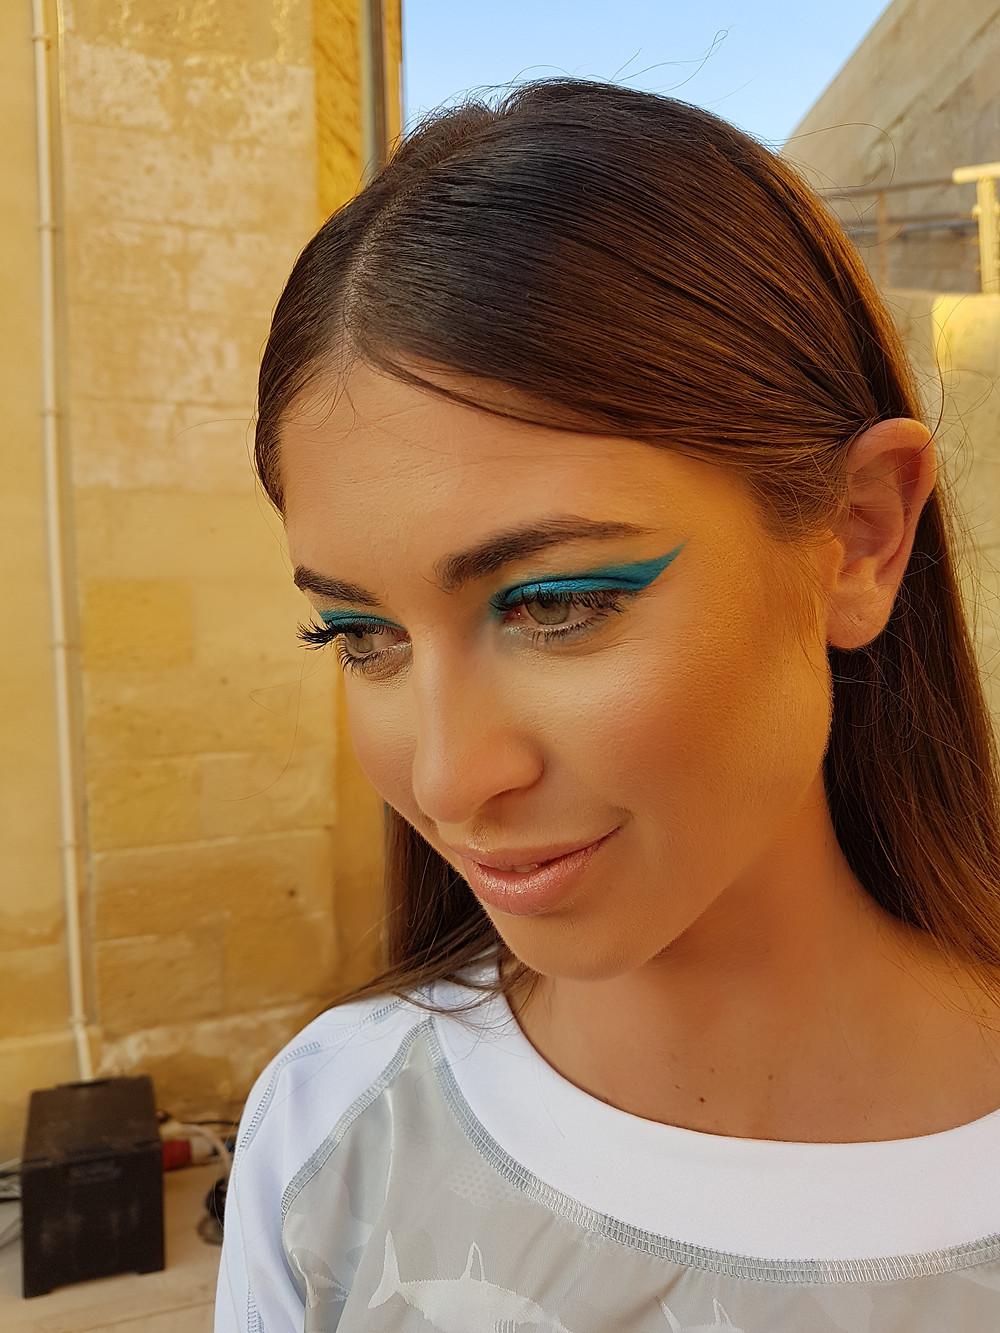 Malta Fashion Week 2018 Makeup and hair. Temple Magazine